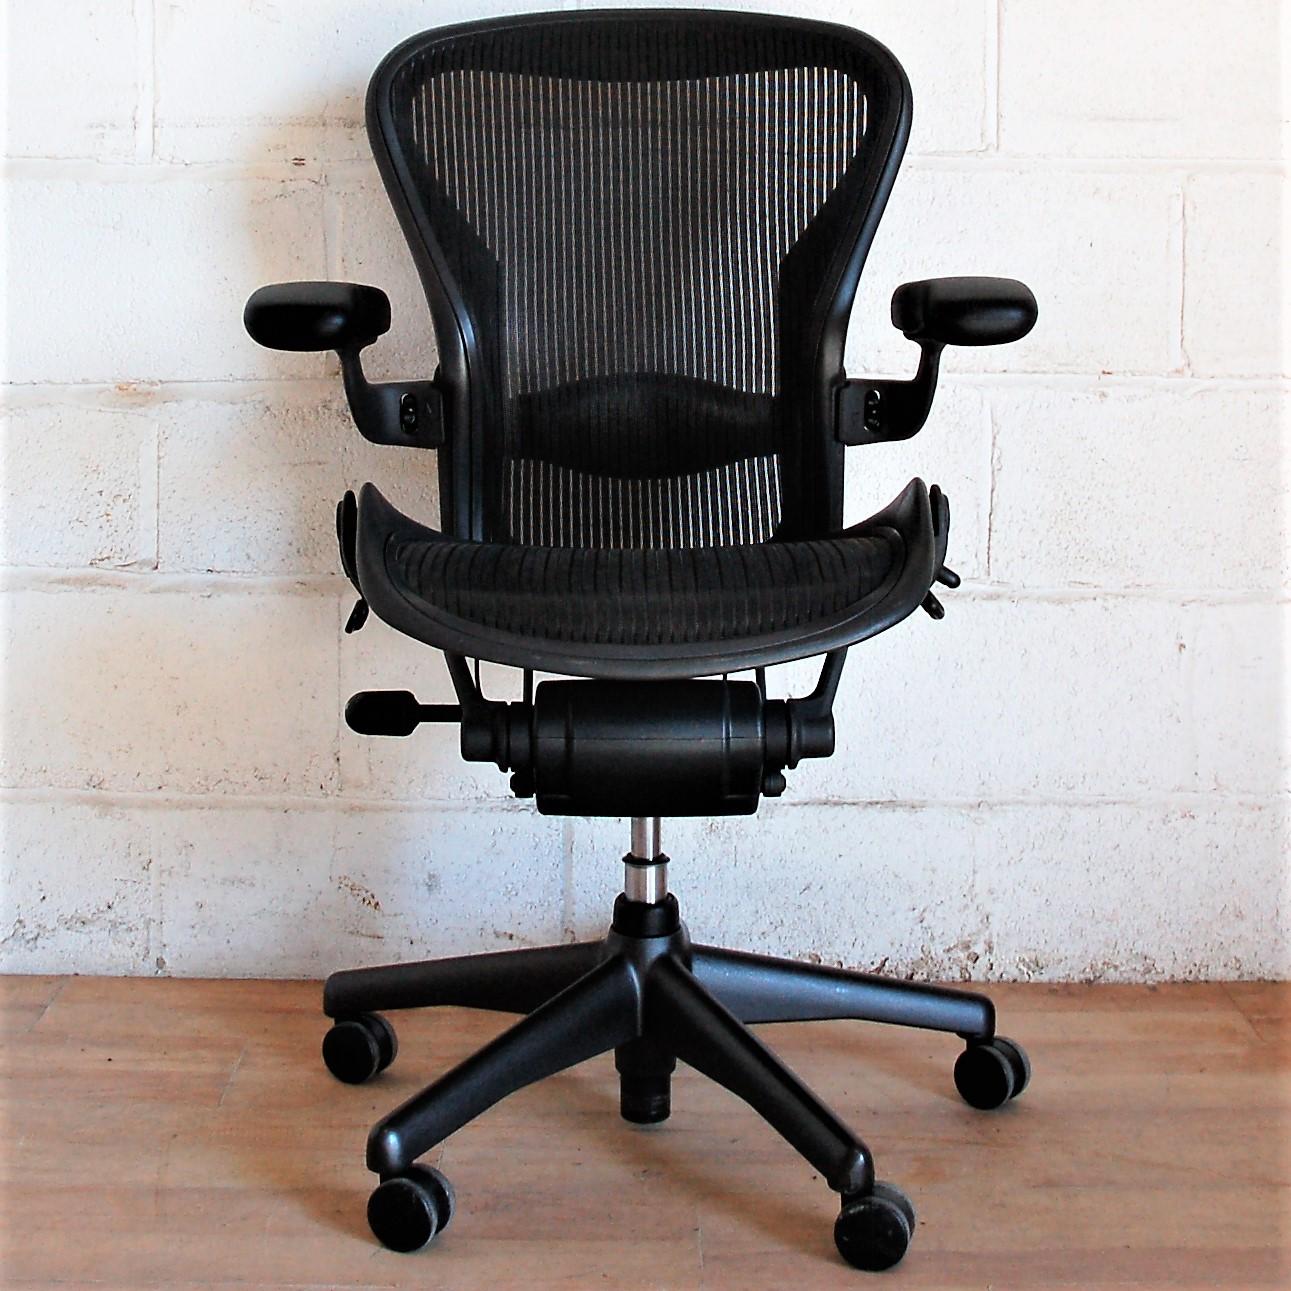 HERMAN MILLER Aeron Size B Task Chair 2180 Swivel Chair